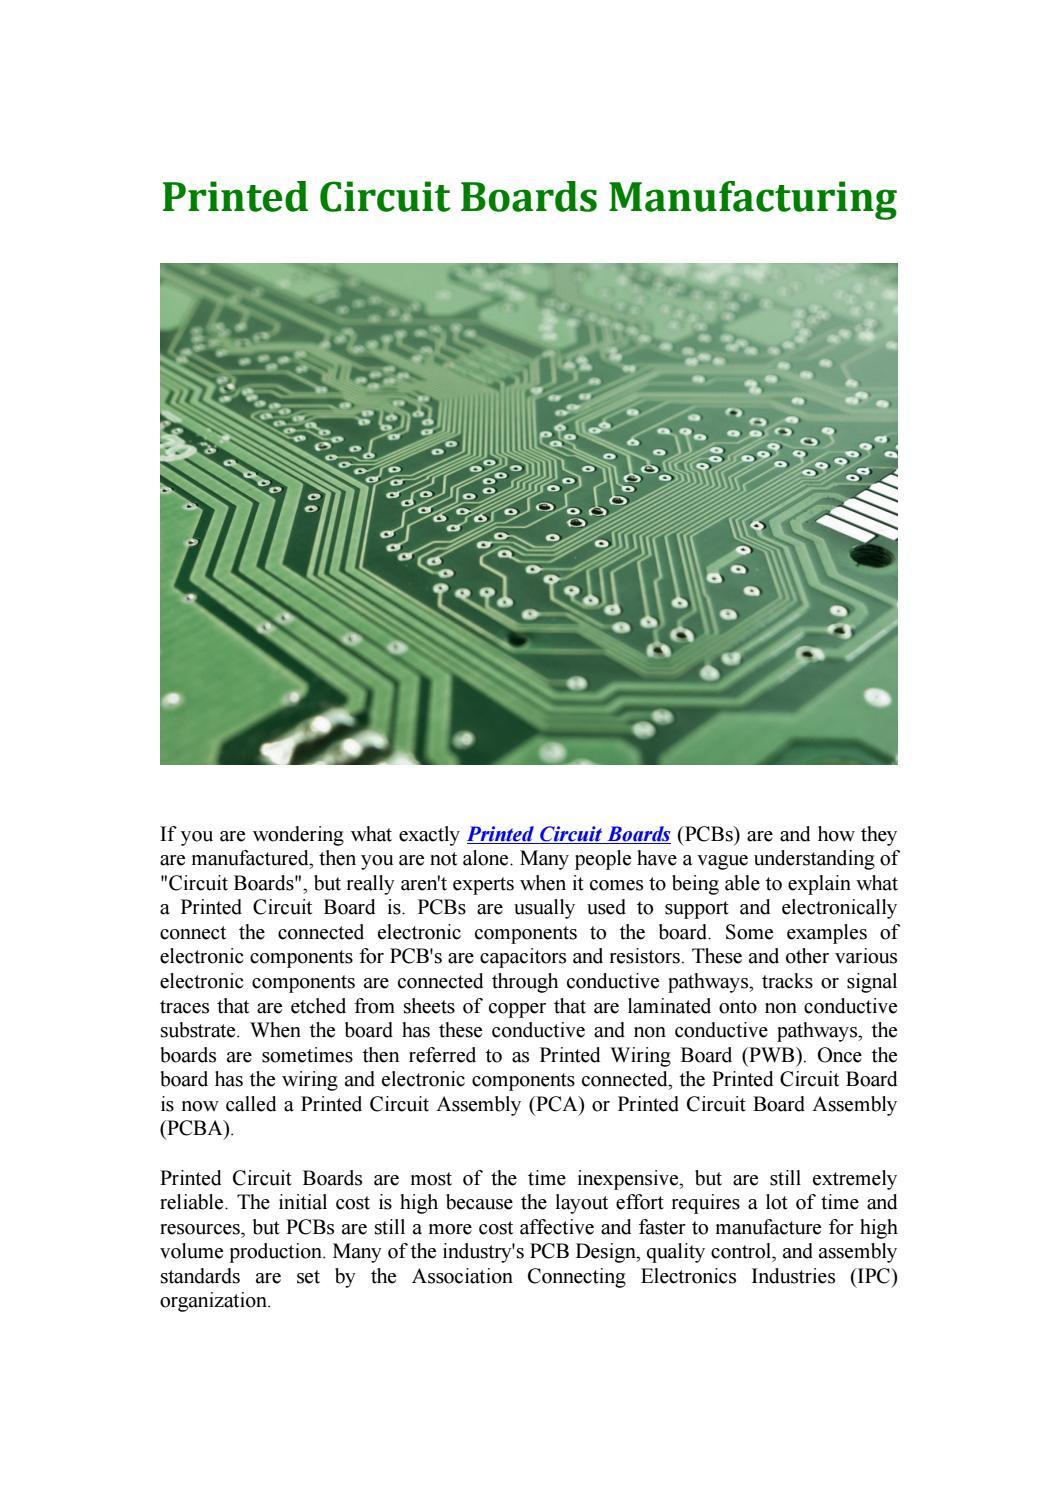 Printed Circuit Board by susanmartzweb - issuu